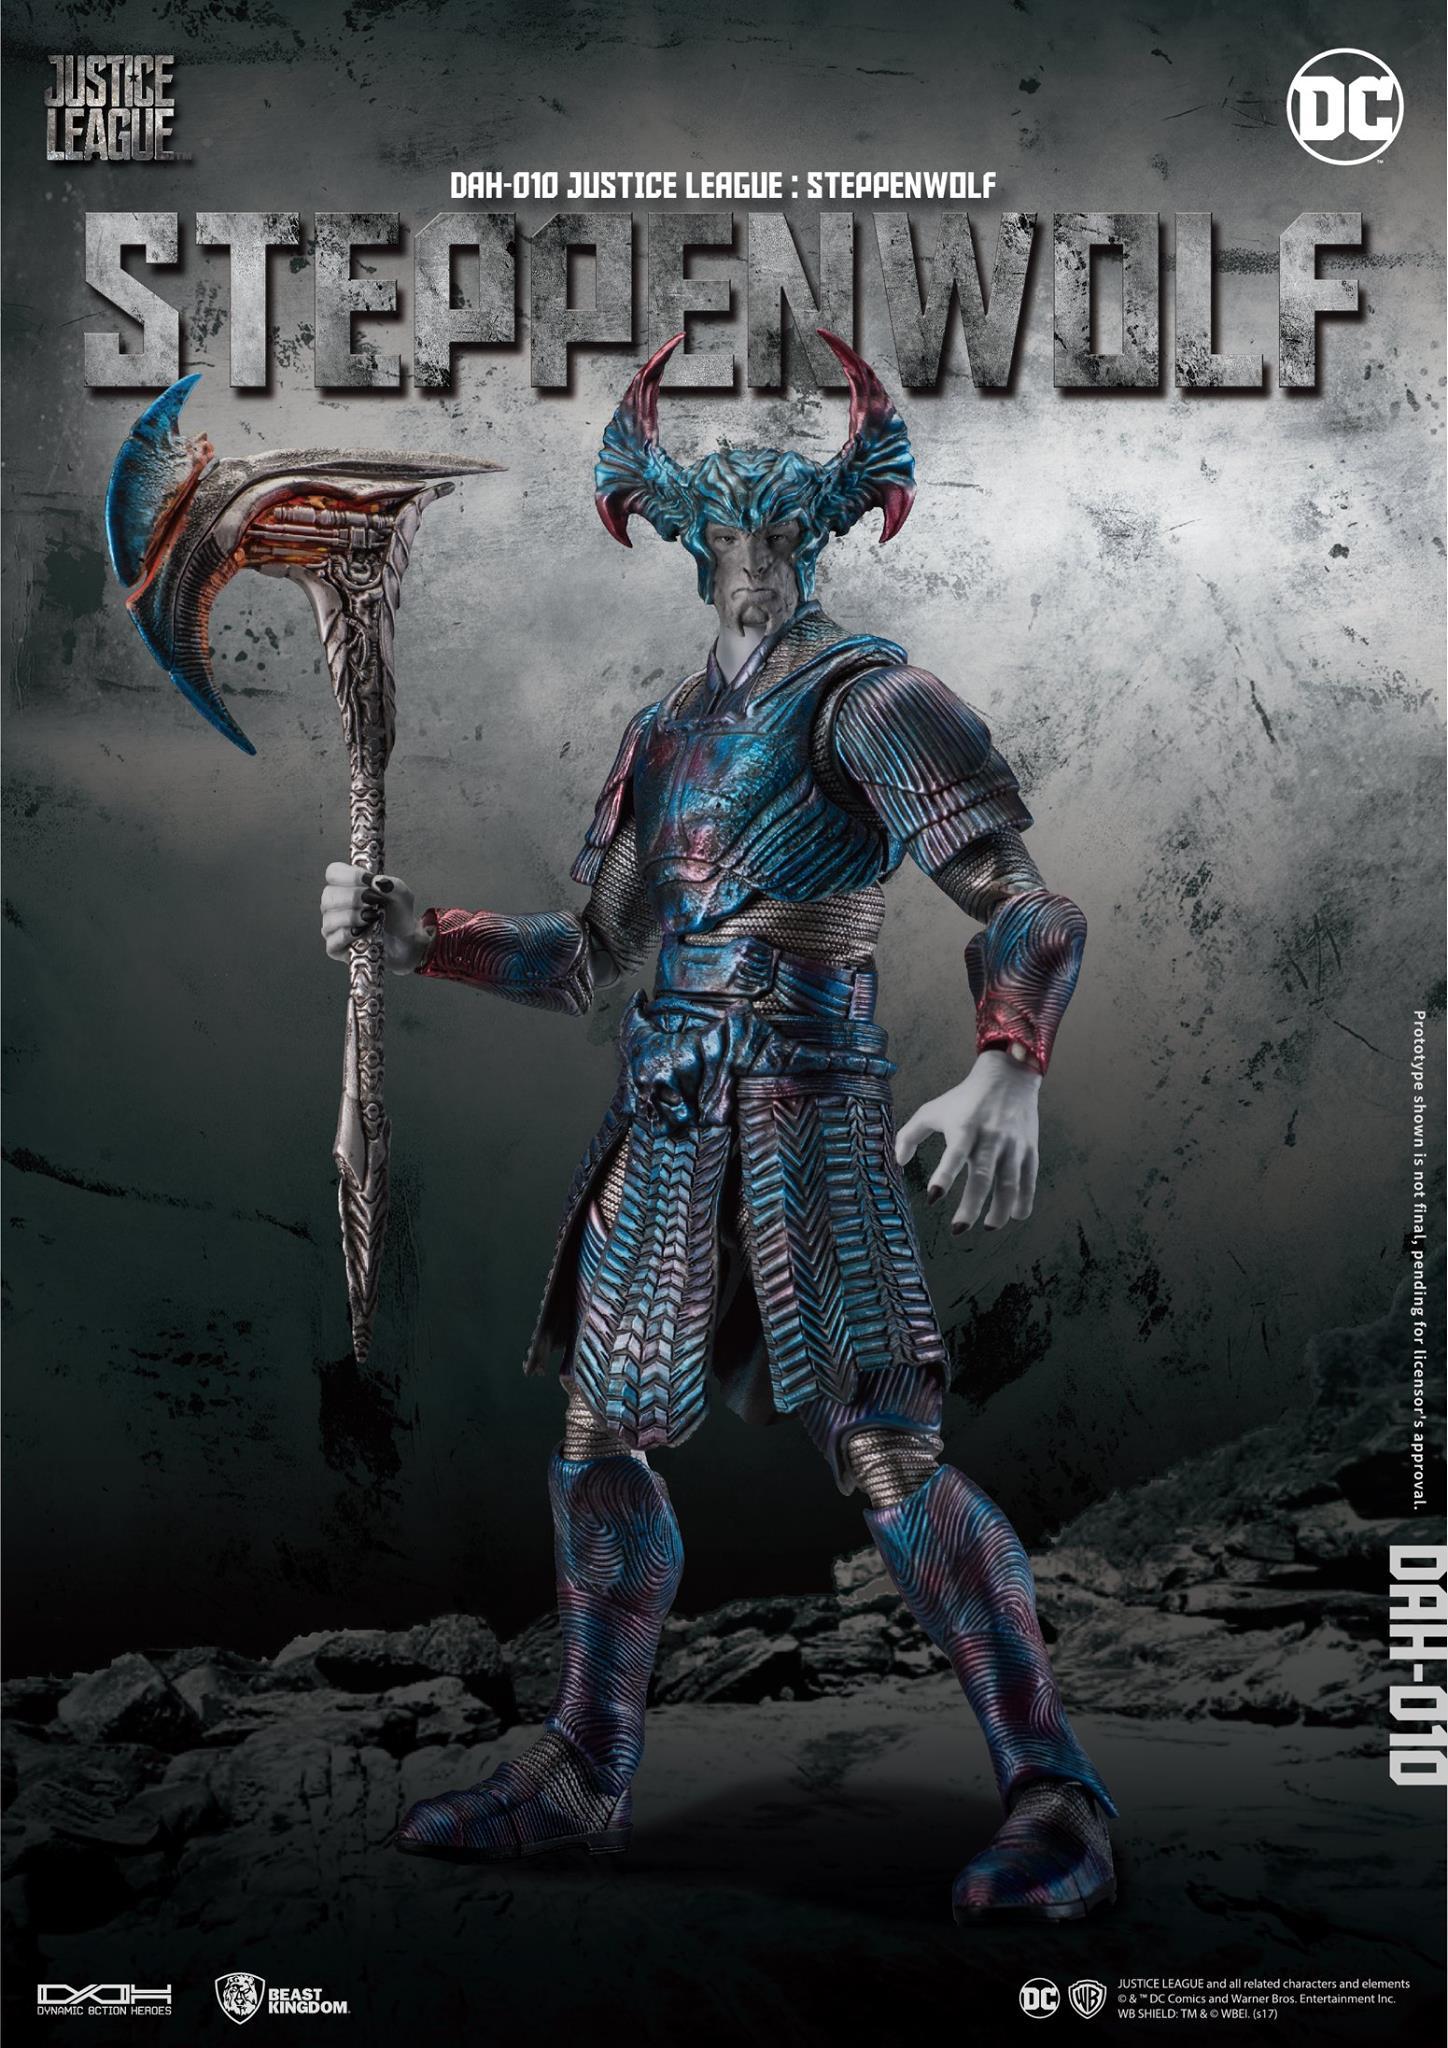 DAH-Justice-League-Steppenwolf-002